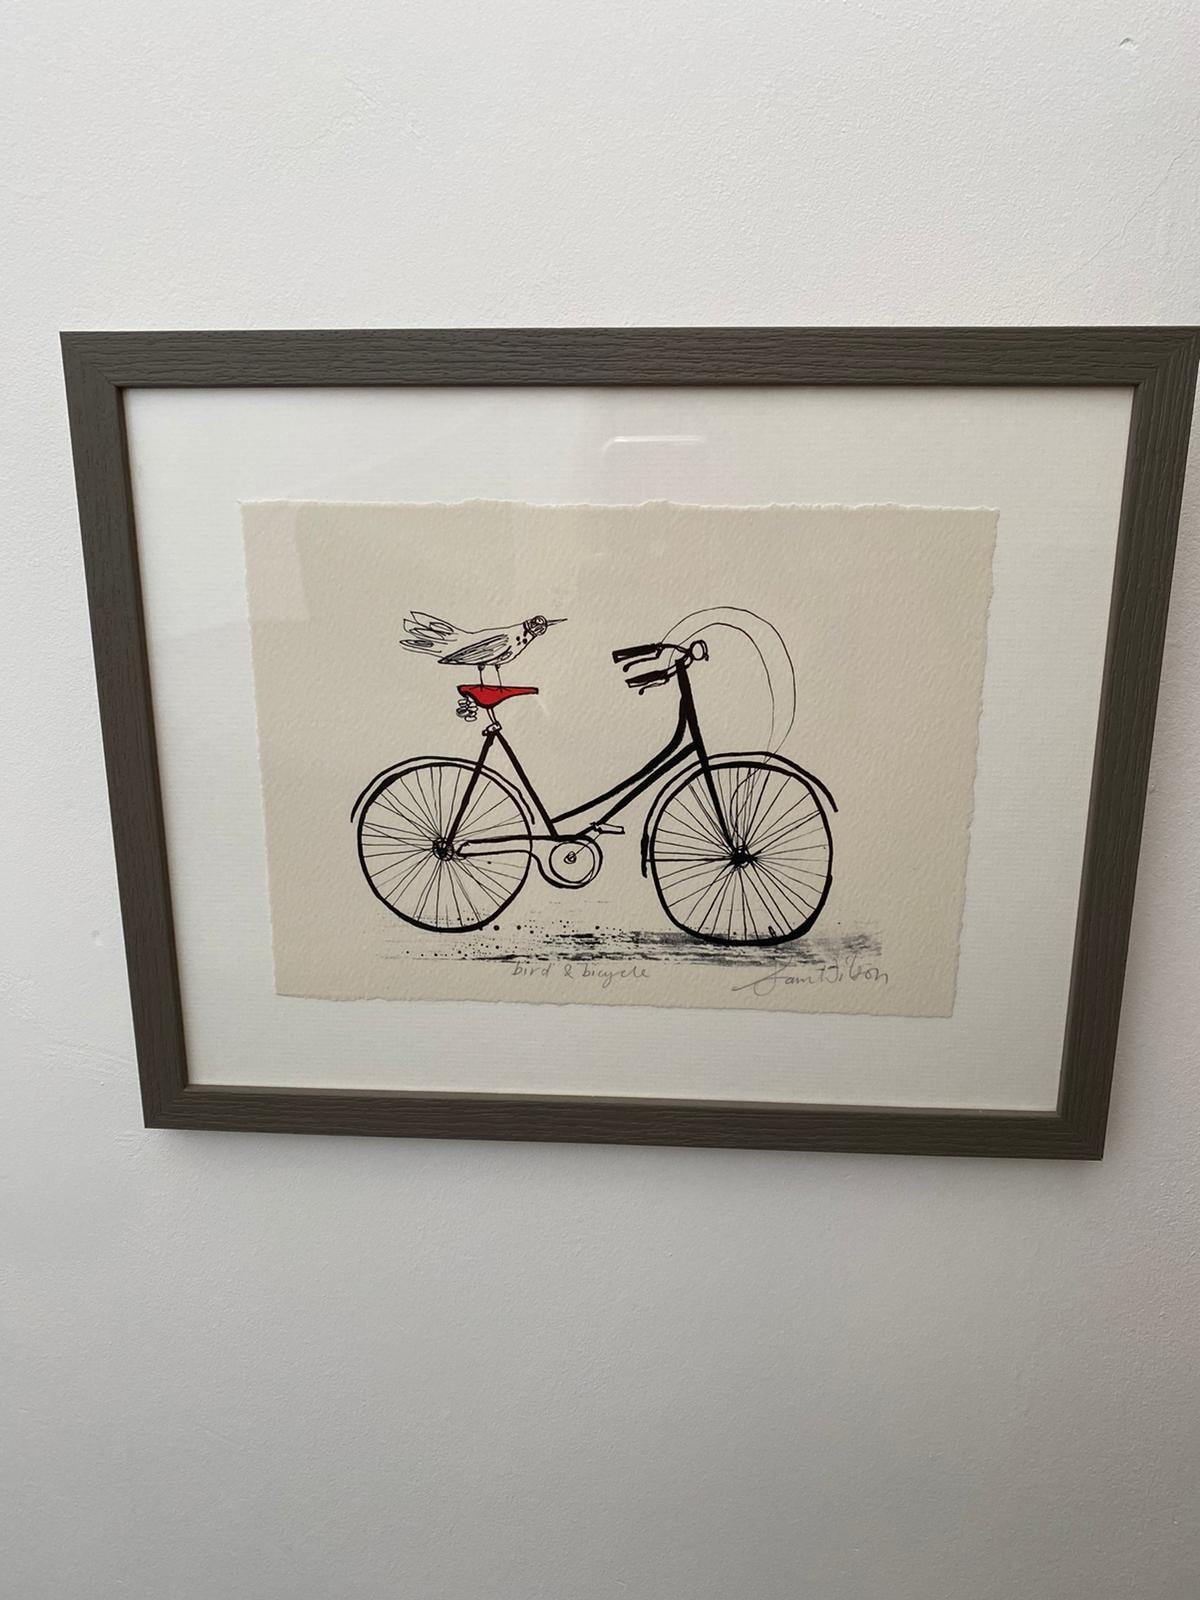 Sam Wilson Illustrations - Bird on Bike